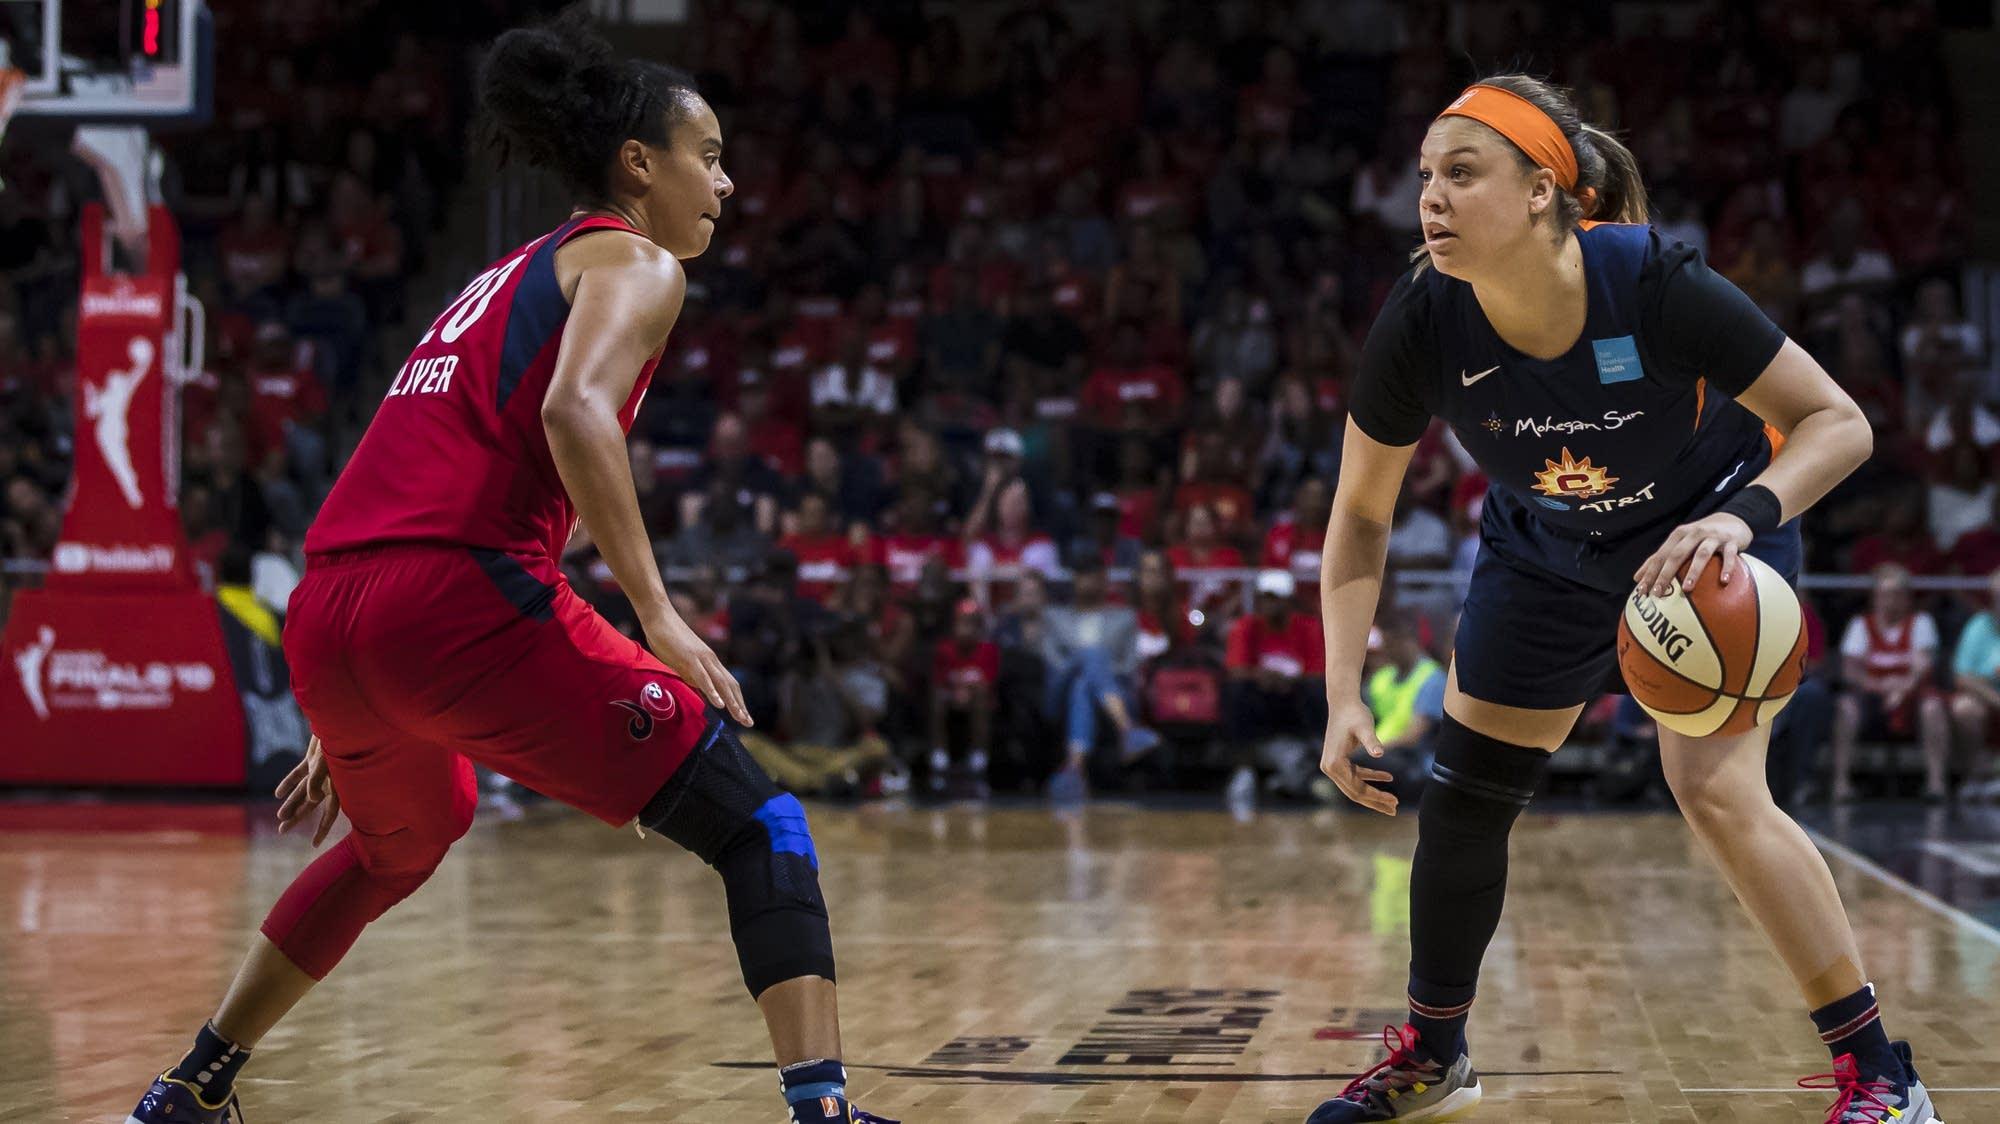 Ex-Gophers hoops star Banham set to join Minnesota Lynx